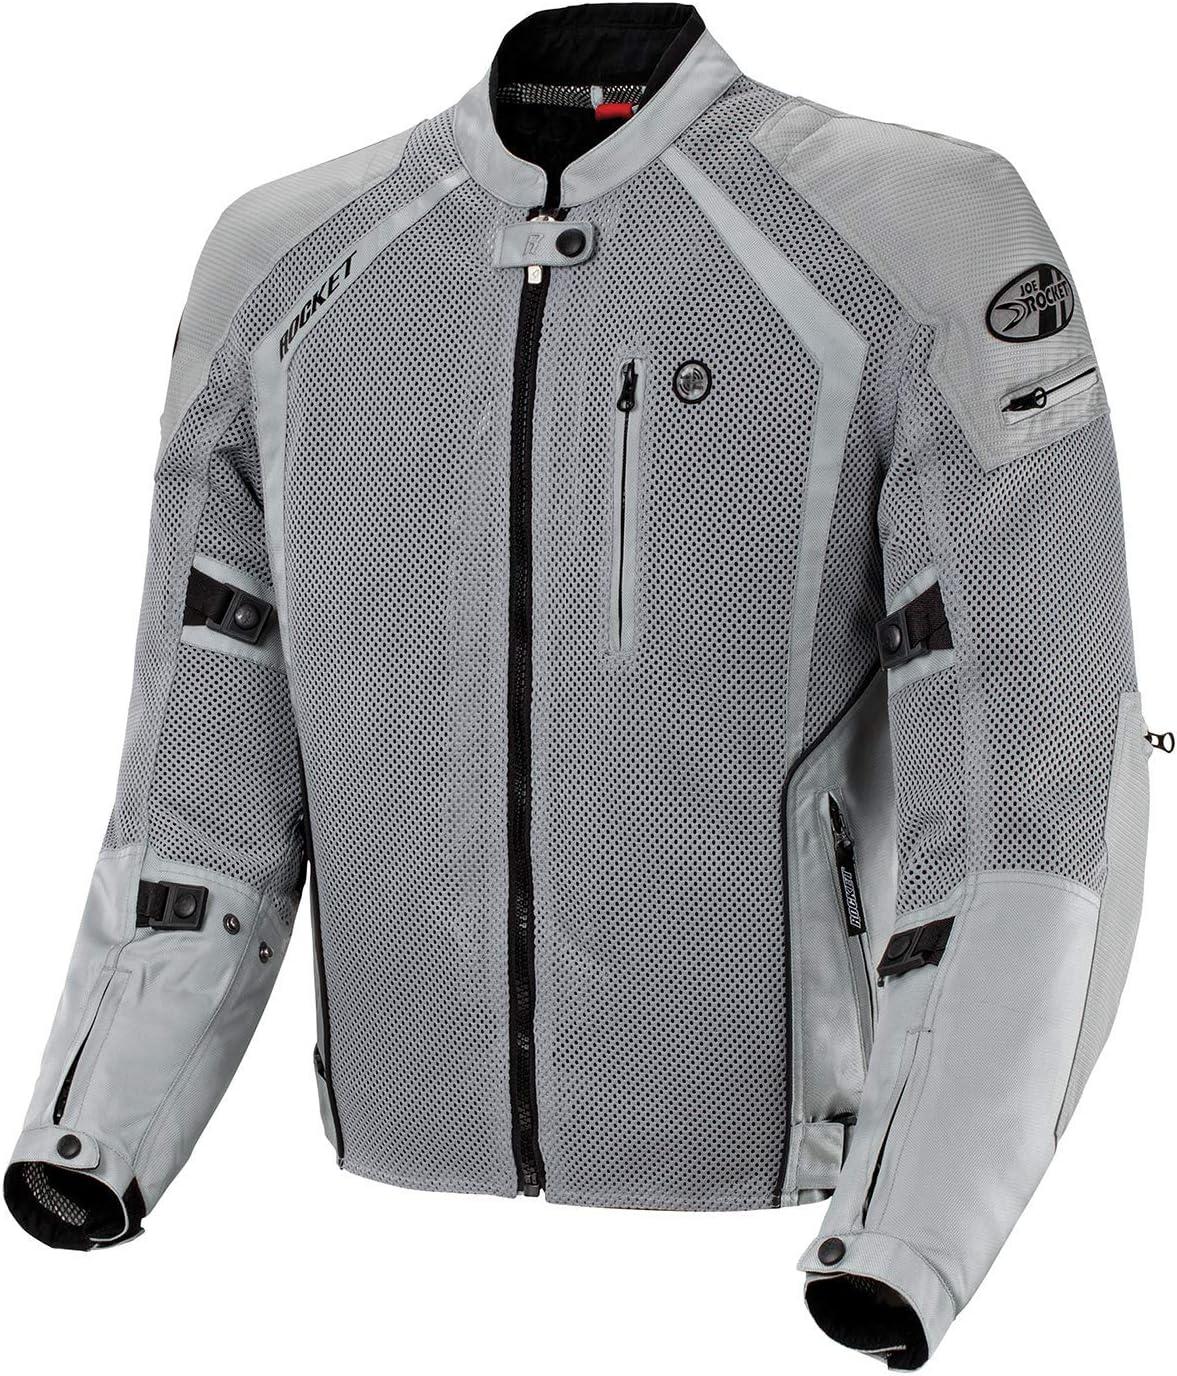 Joe Rocket 1516-4504 Phoenix Ion Mens Mesh Motorcycle Jacket Silver, Large